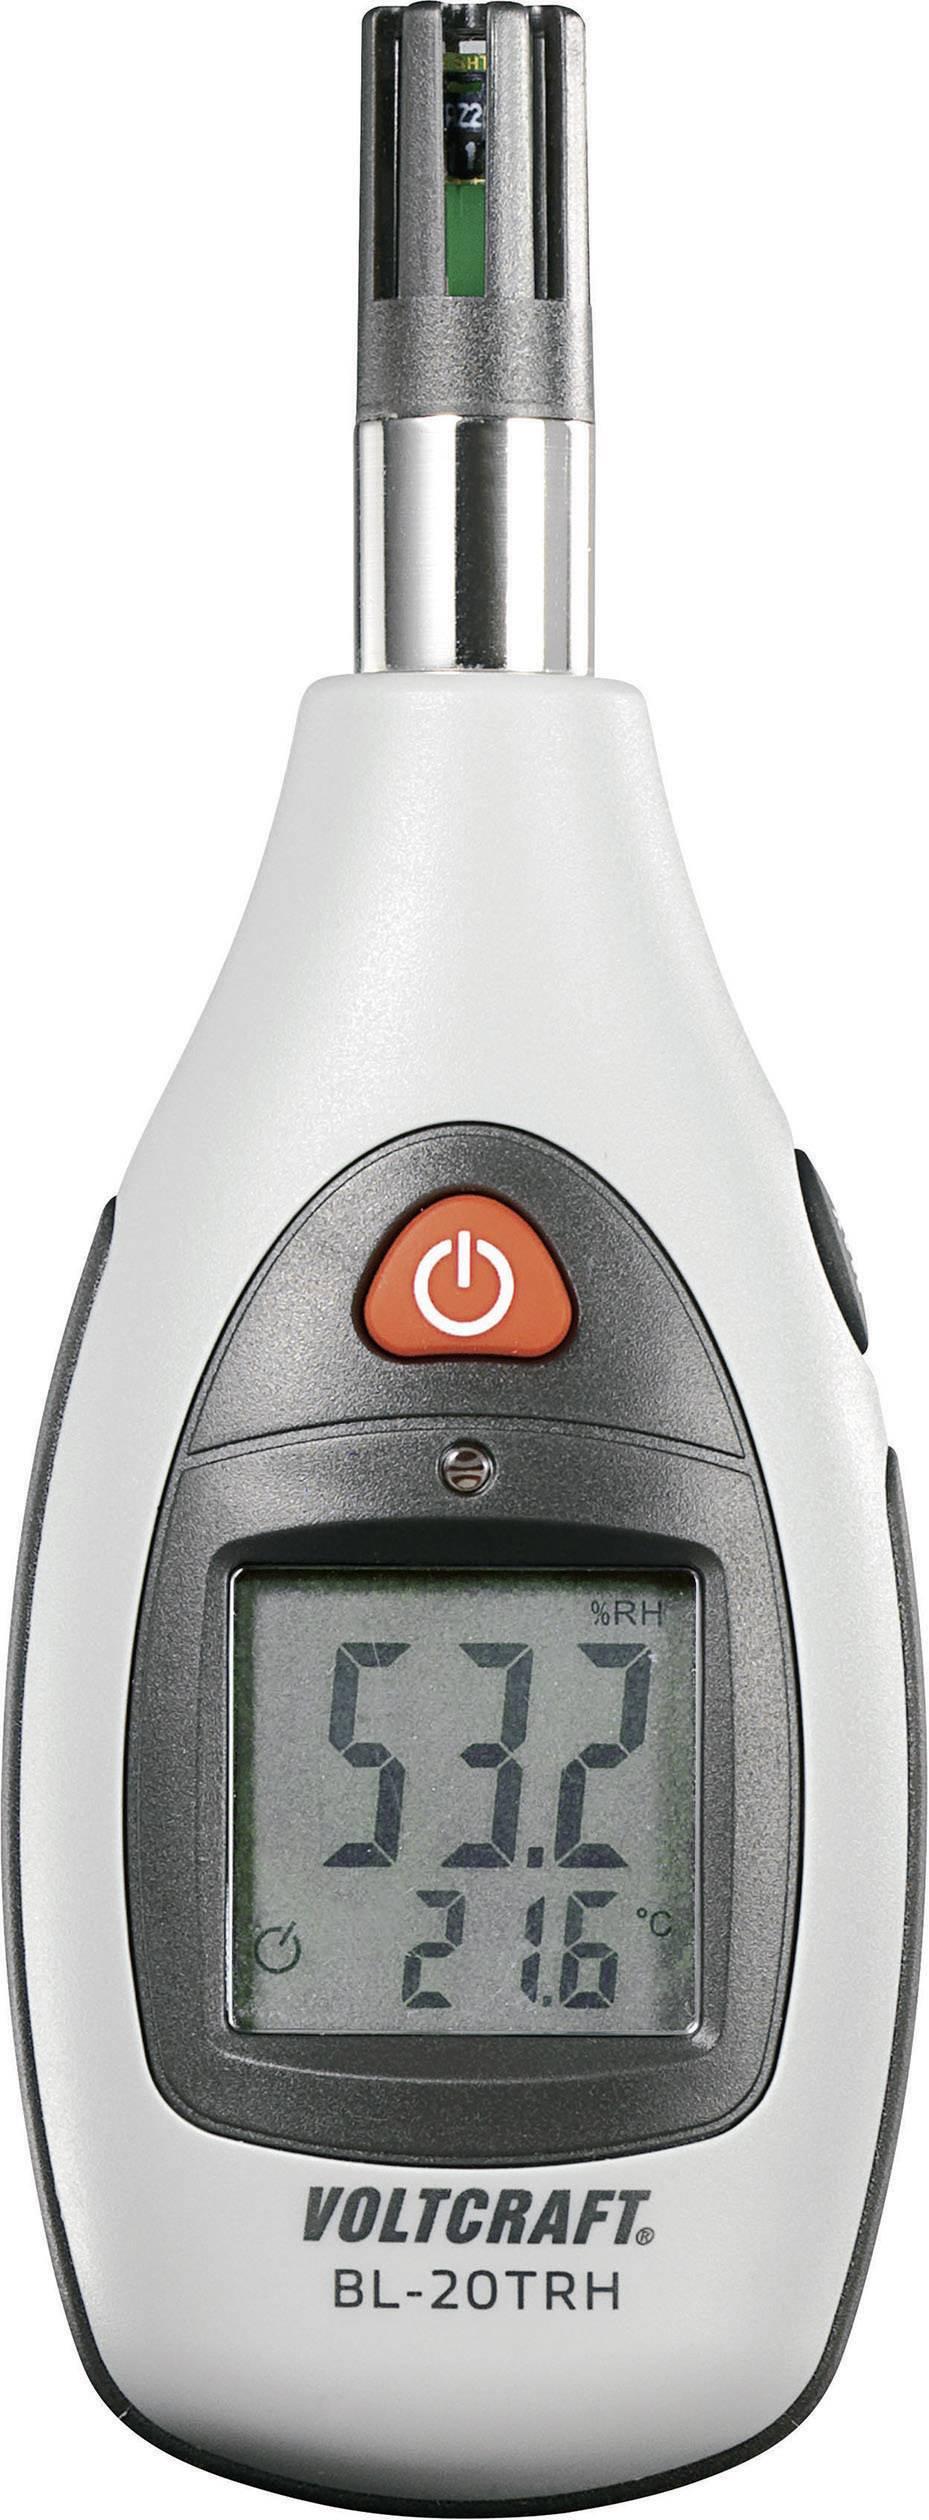 VOLTCRAFT BL-20 TRH Luftfeuchtem ...  Werksstandard (ohne Zertifikat)